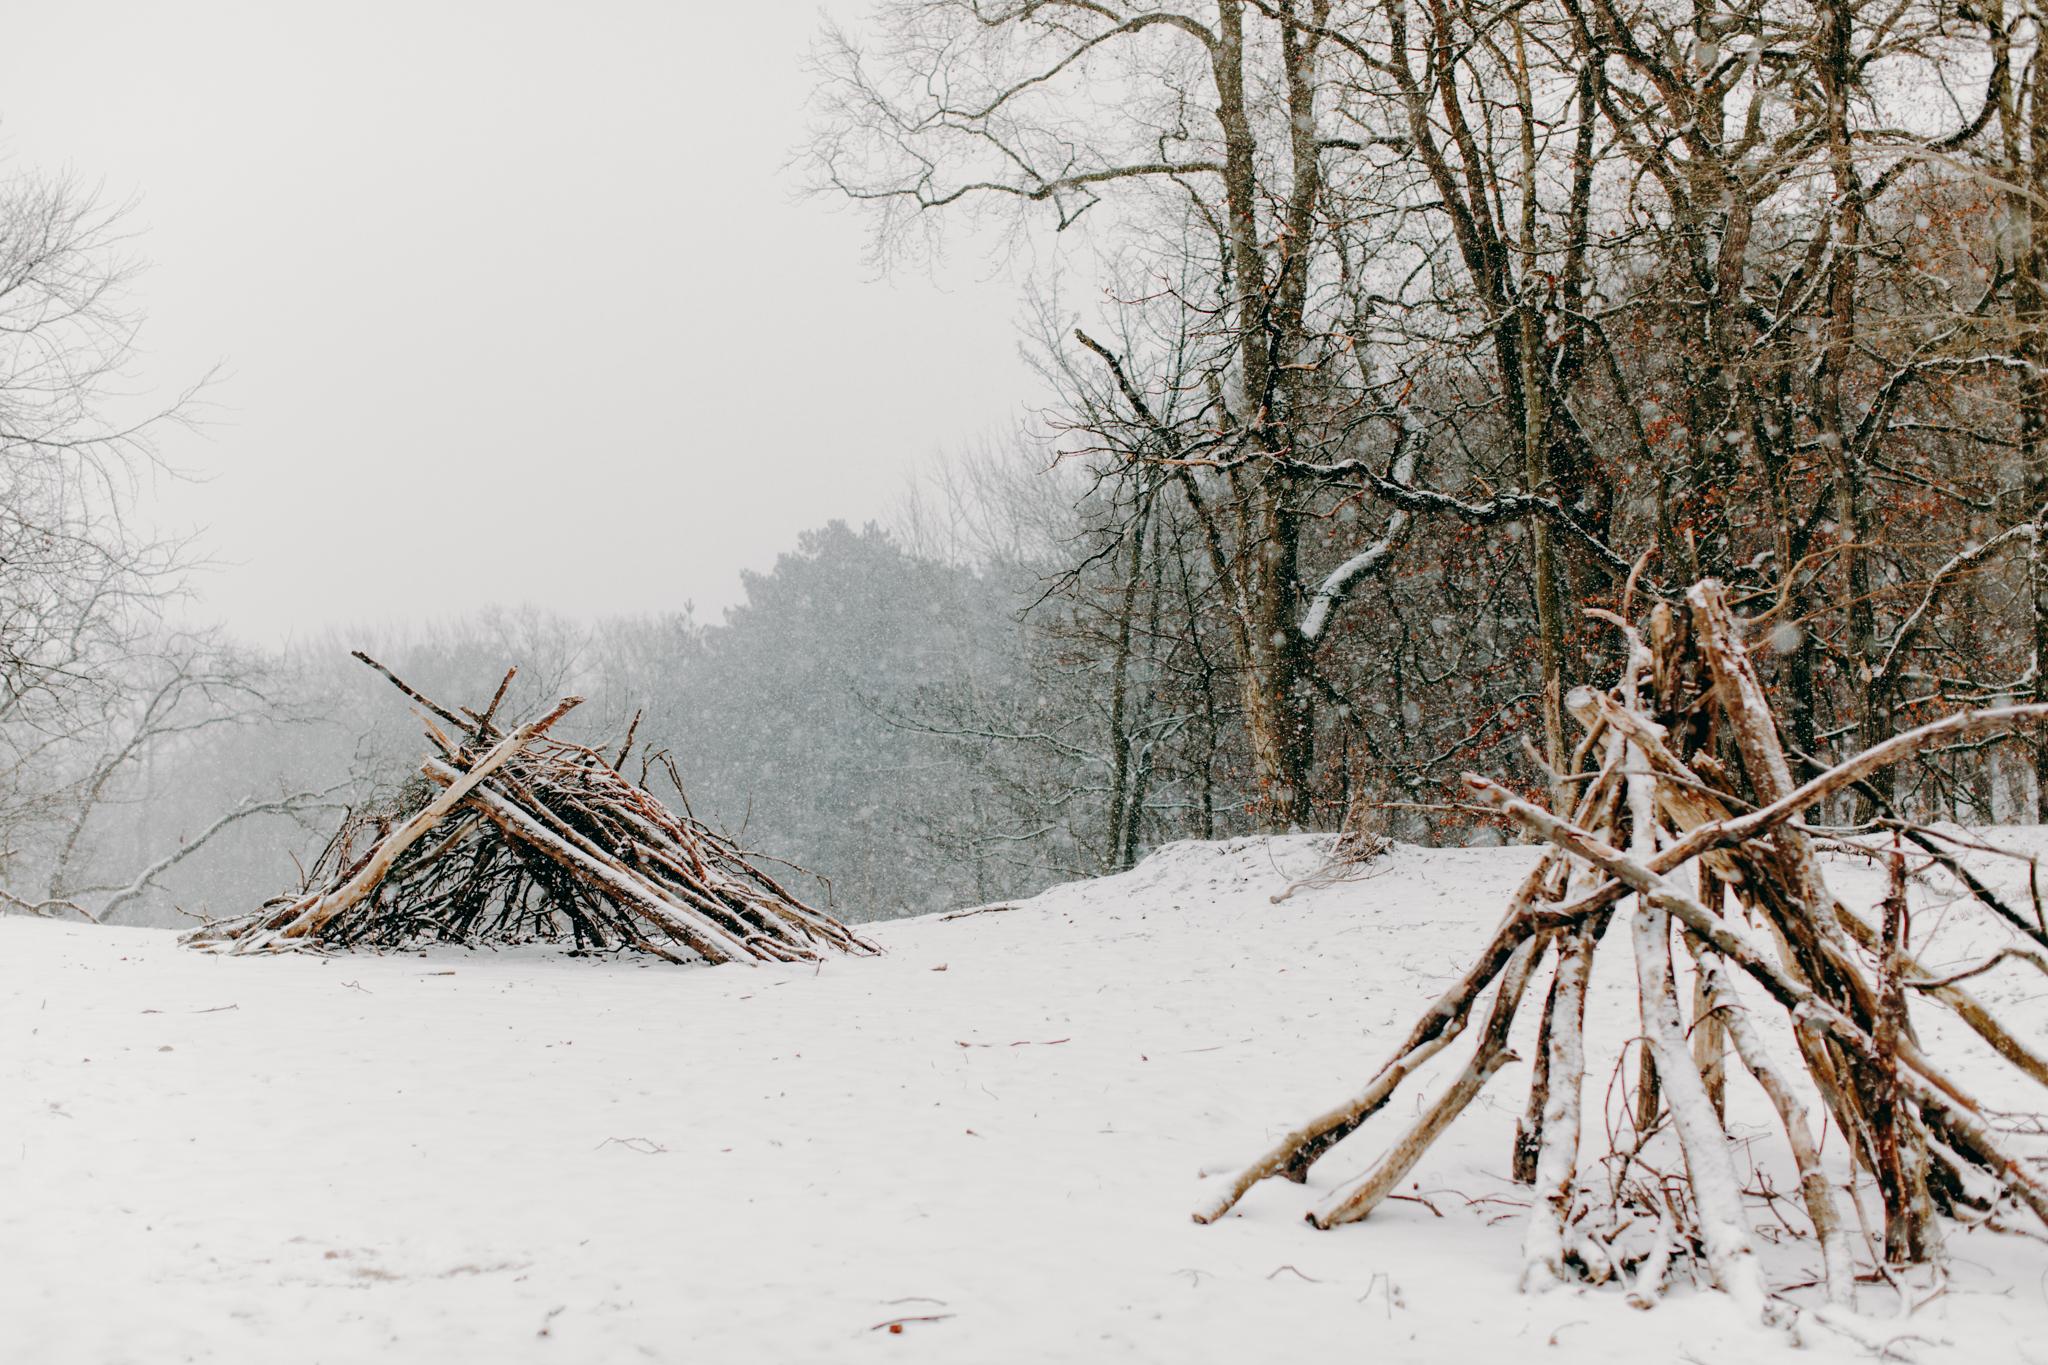 019-winter-sneeuw-oosterplas-bloemendaal.jpg